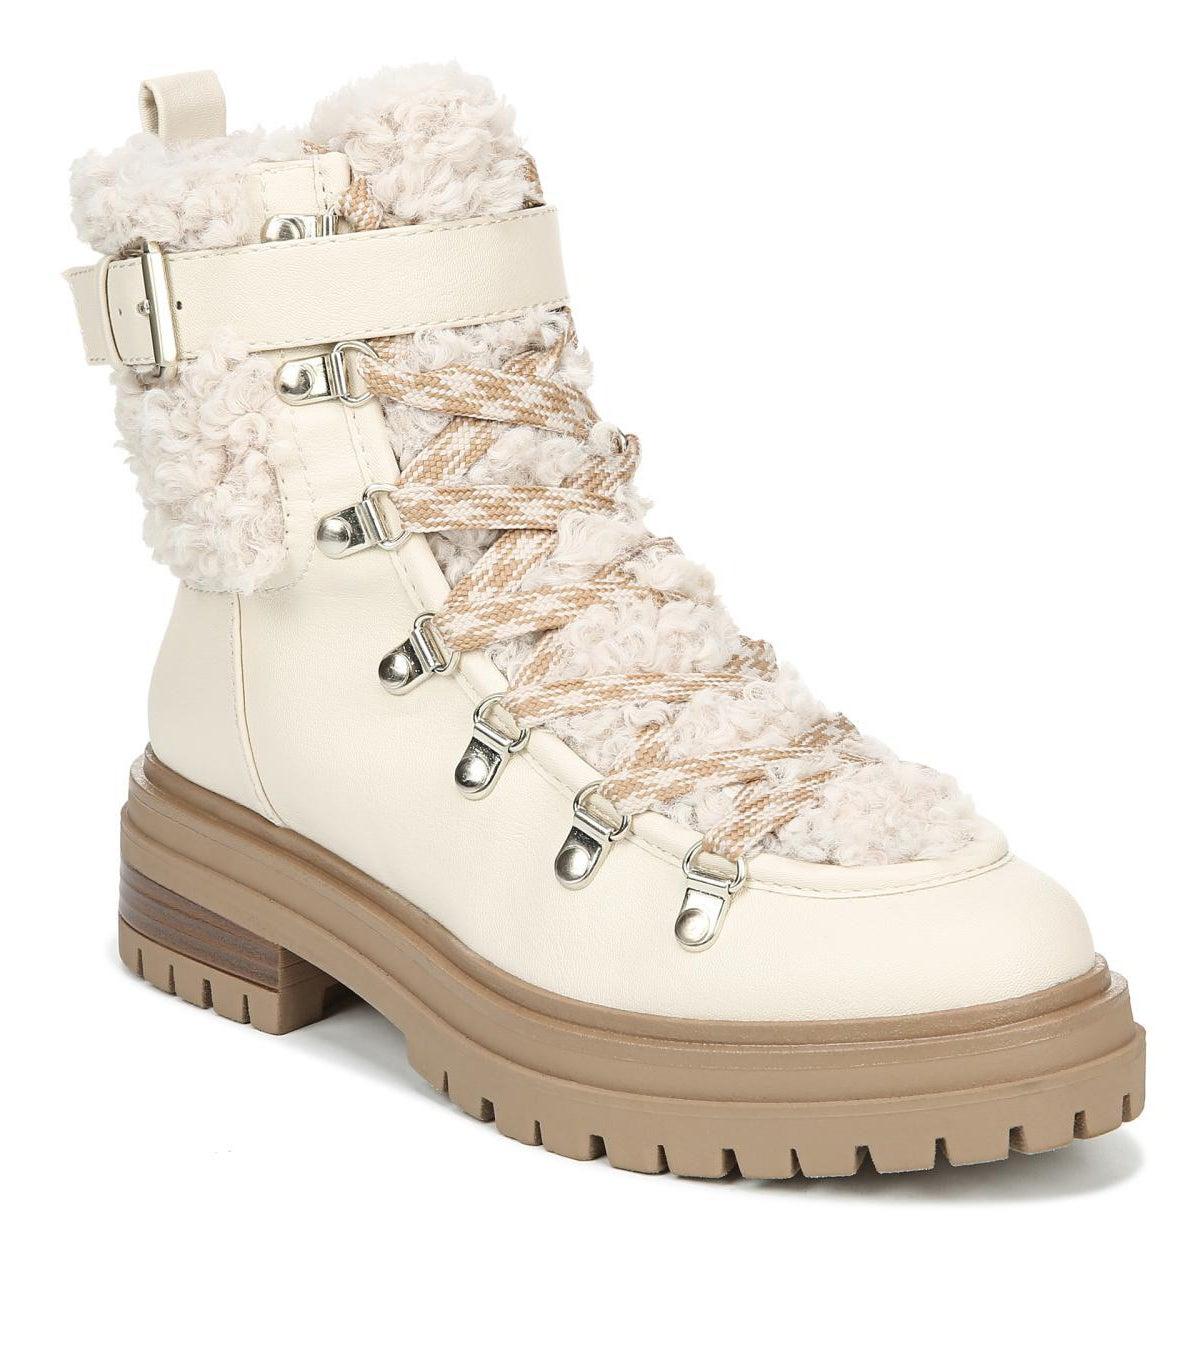 shearling hiking boots